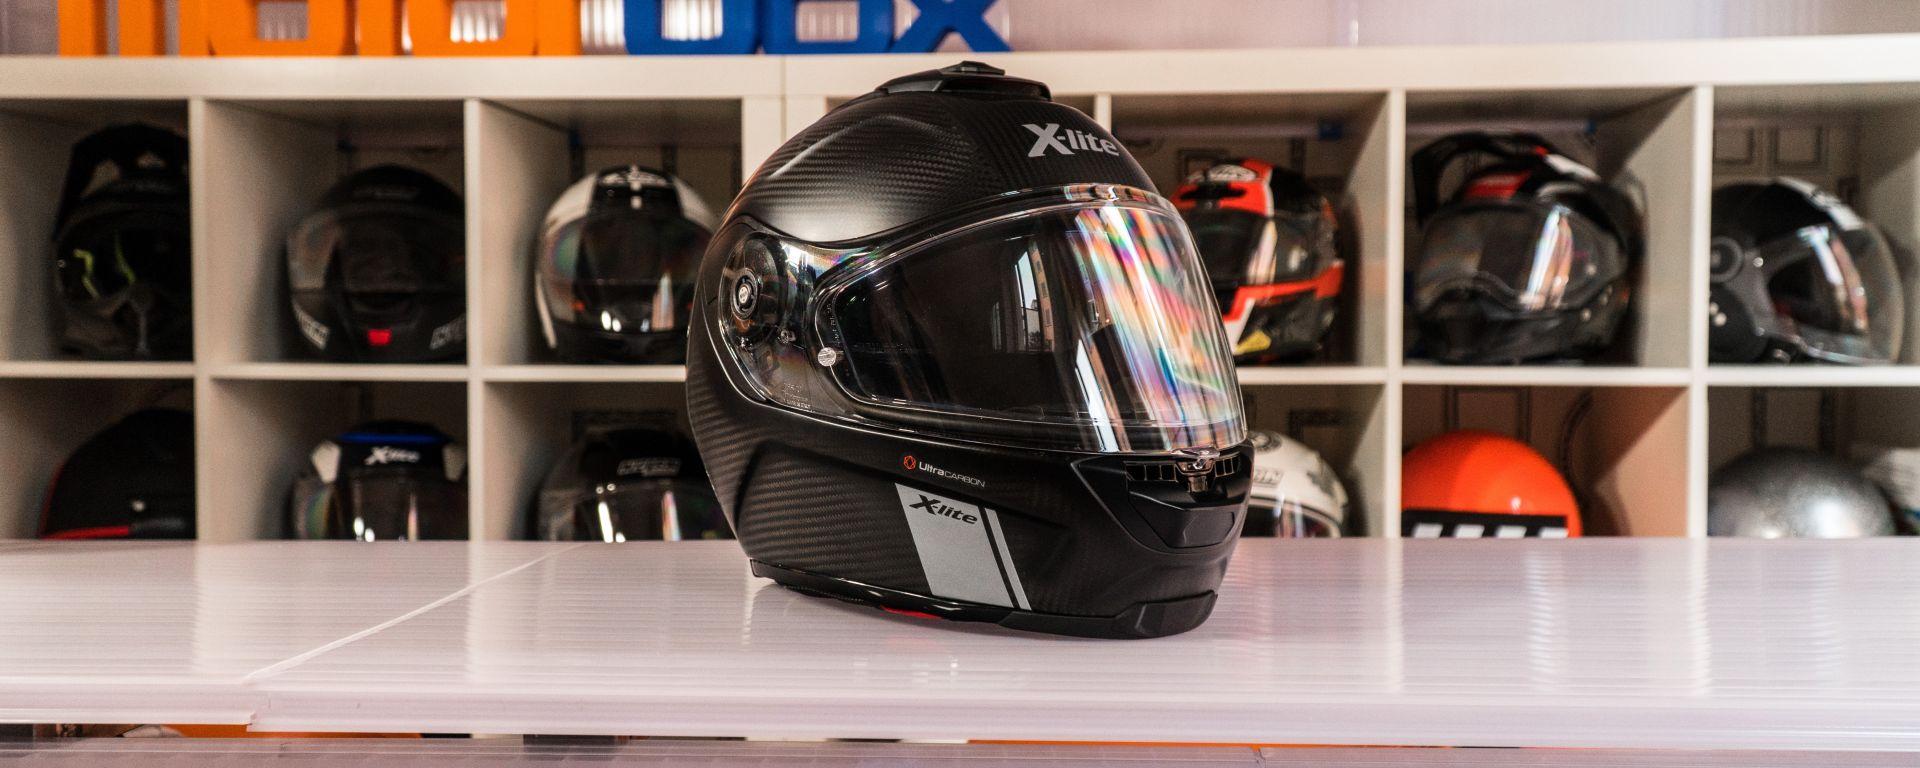 MotorUnboxing: il casco X-lite X-903 UC